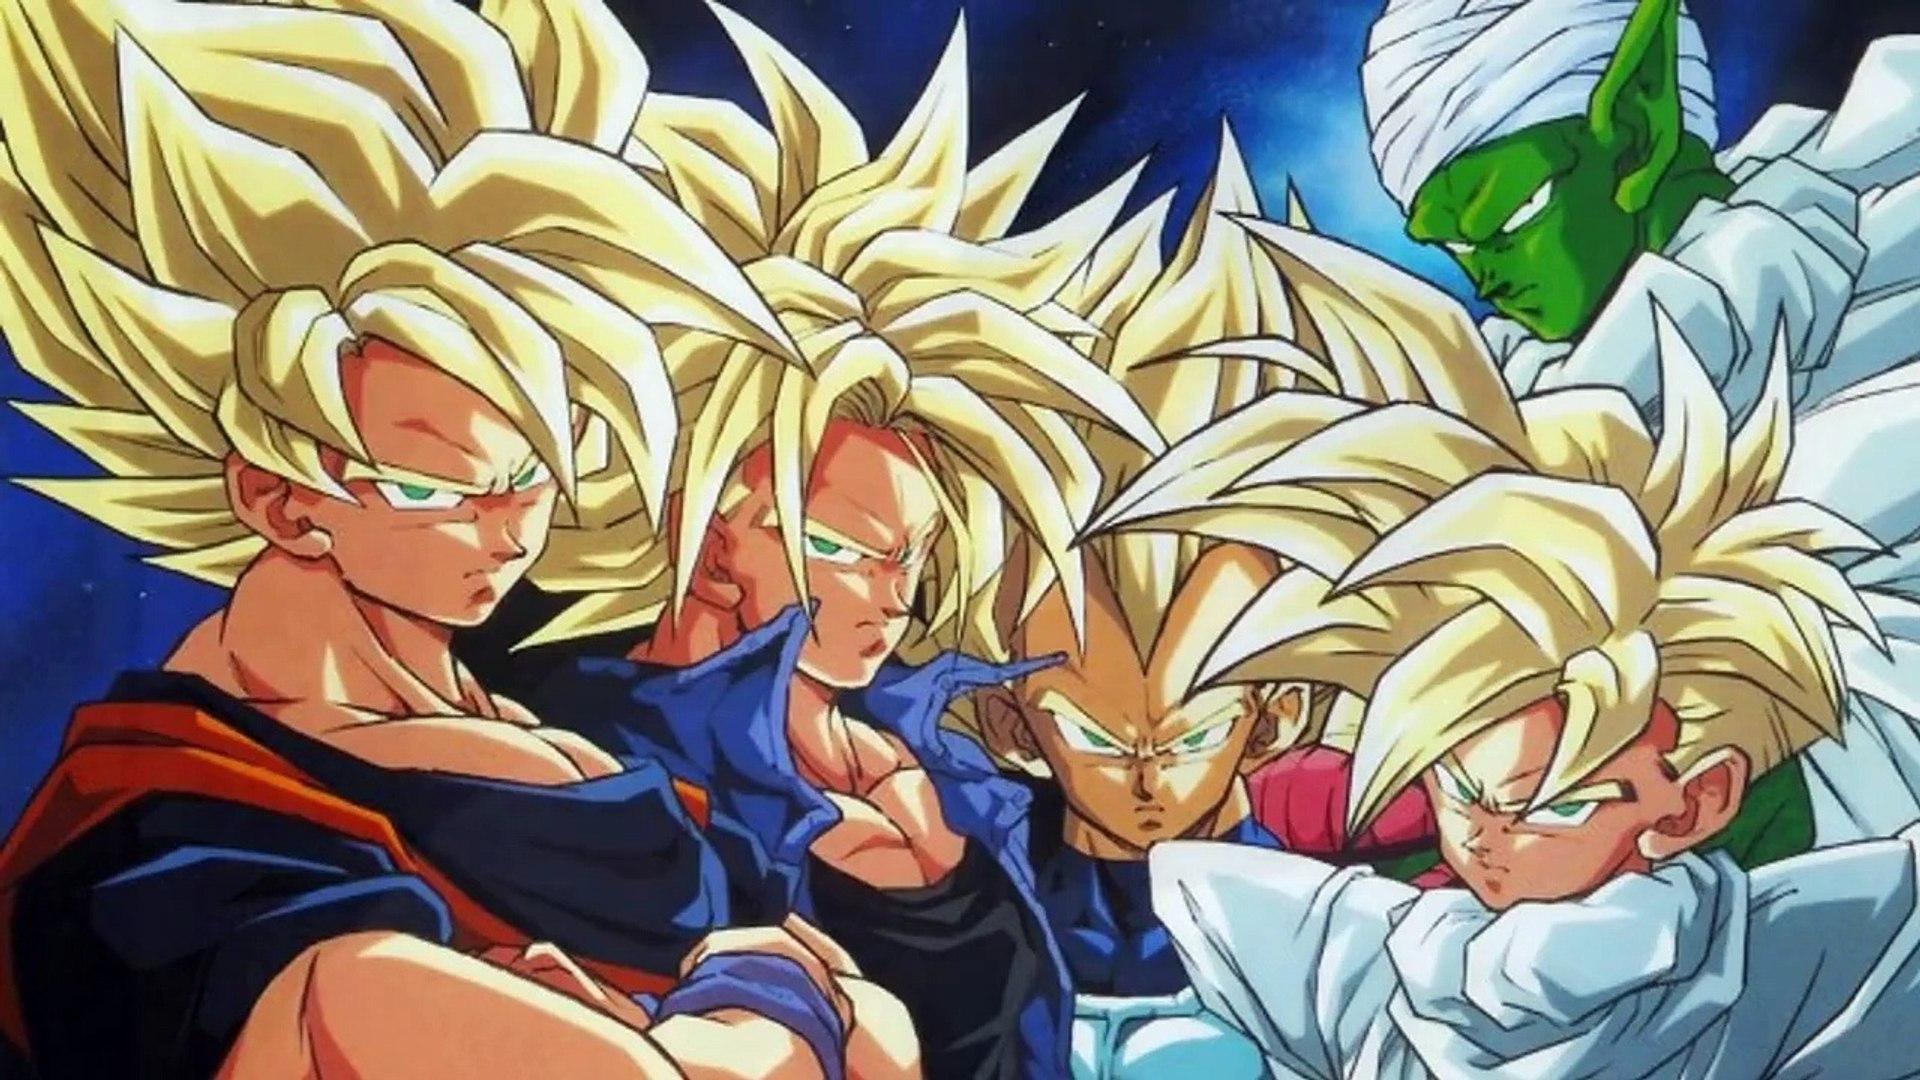 My Top Ten Favorite Anime Shows